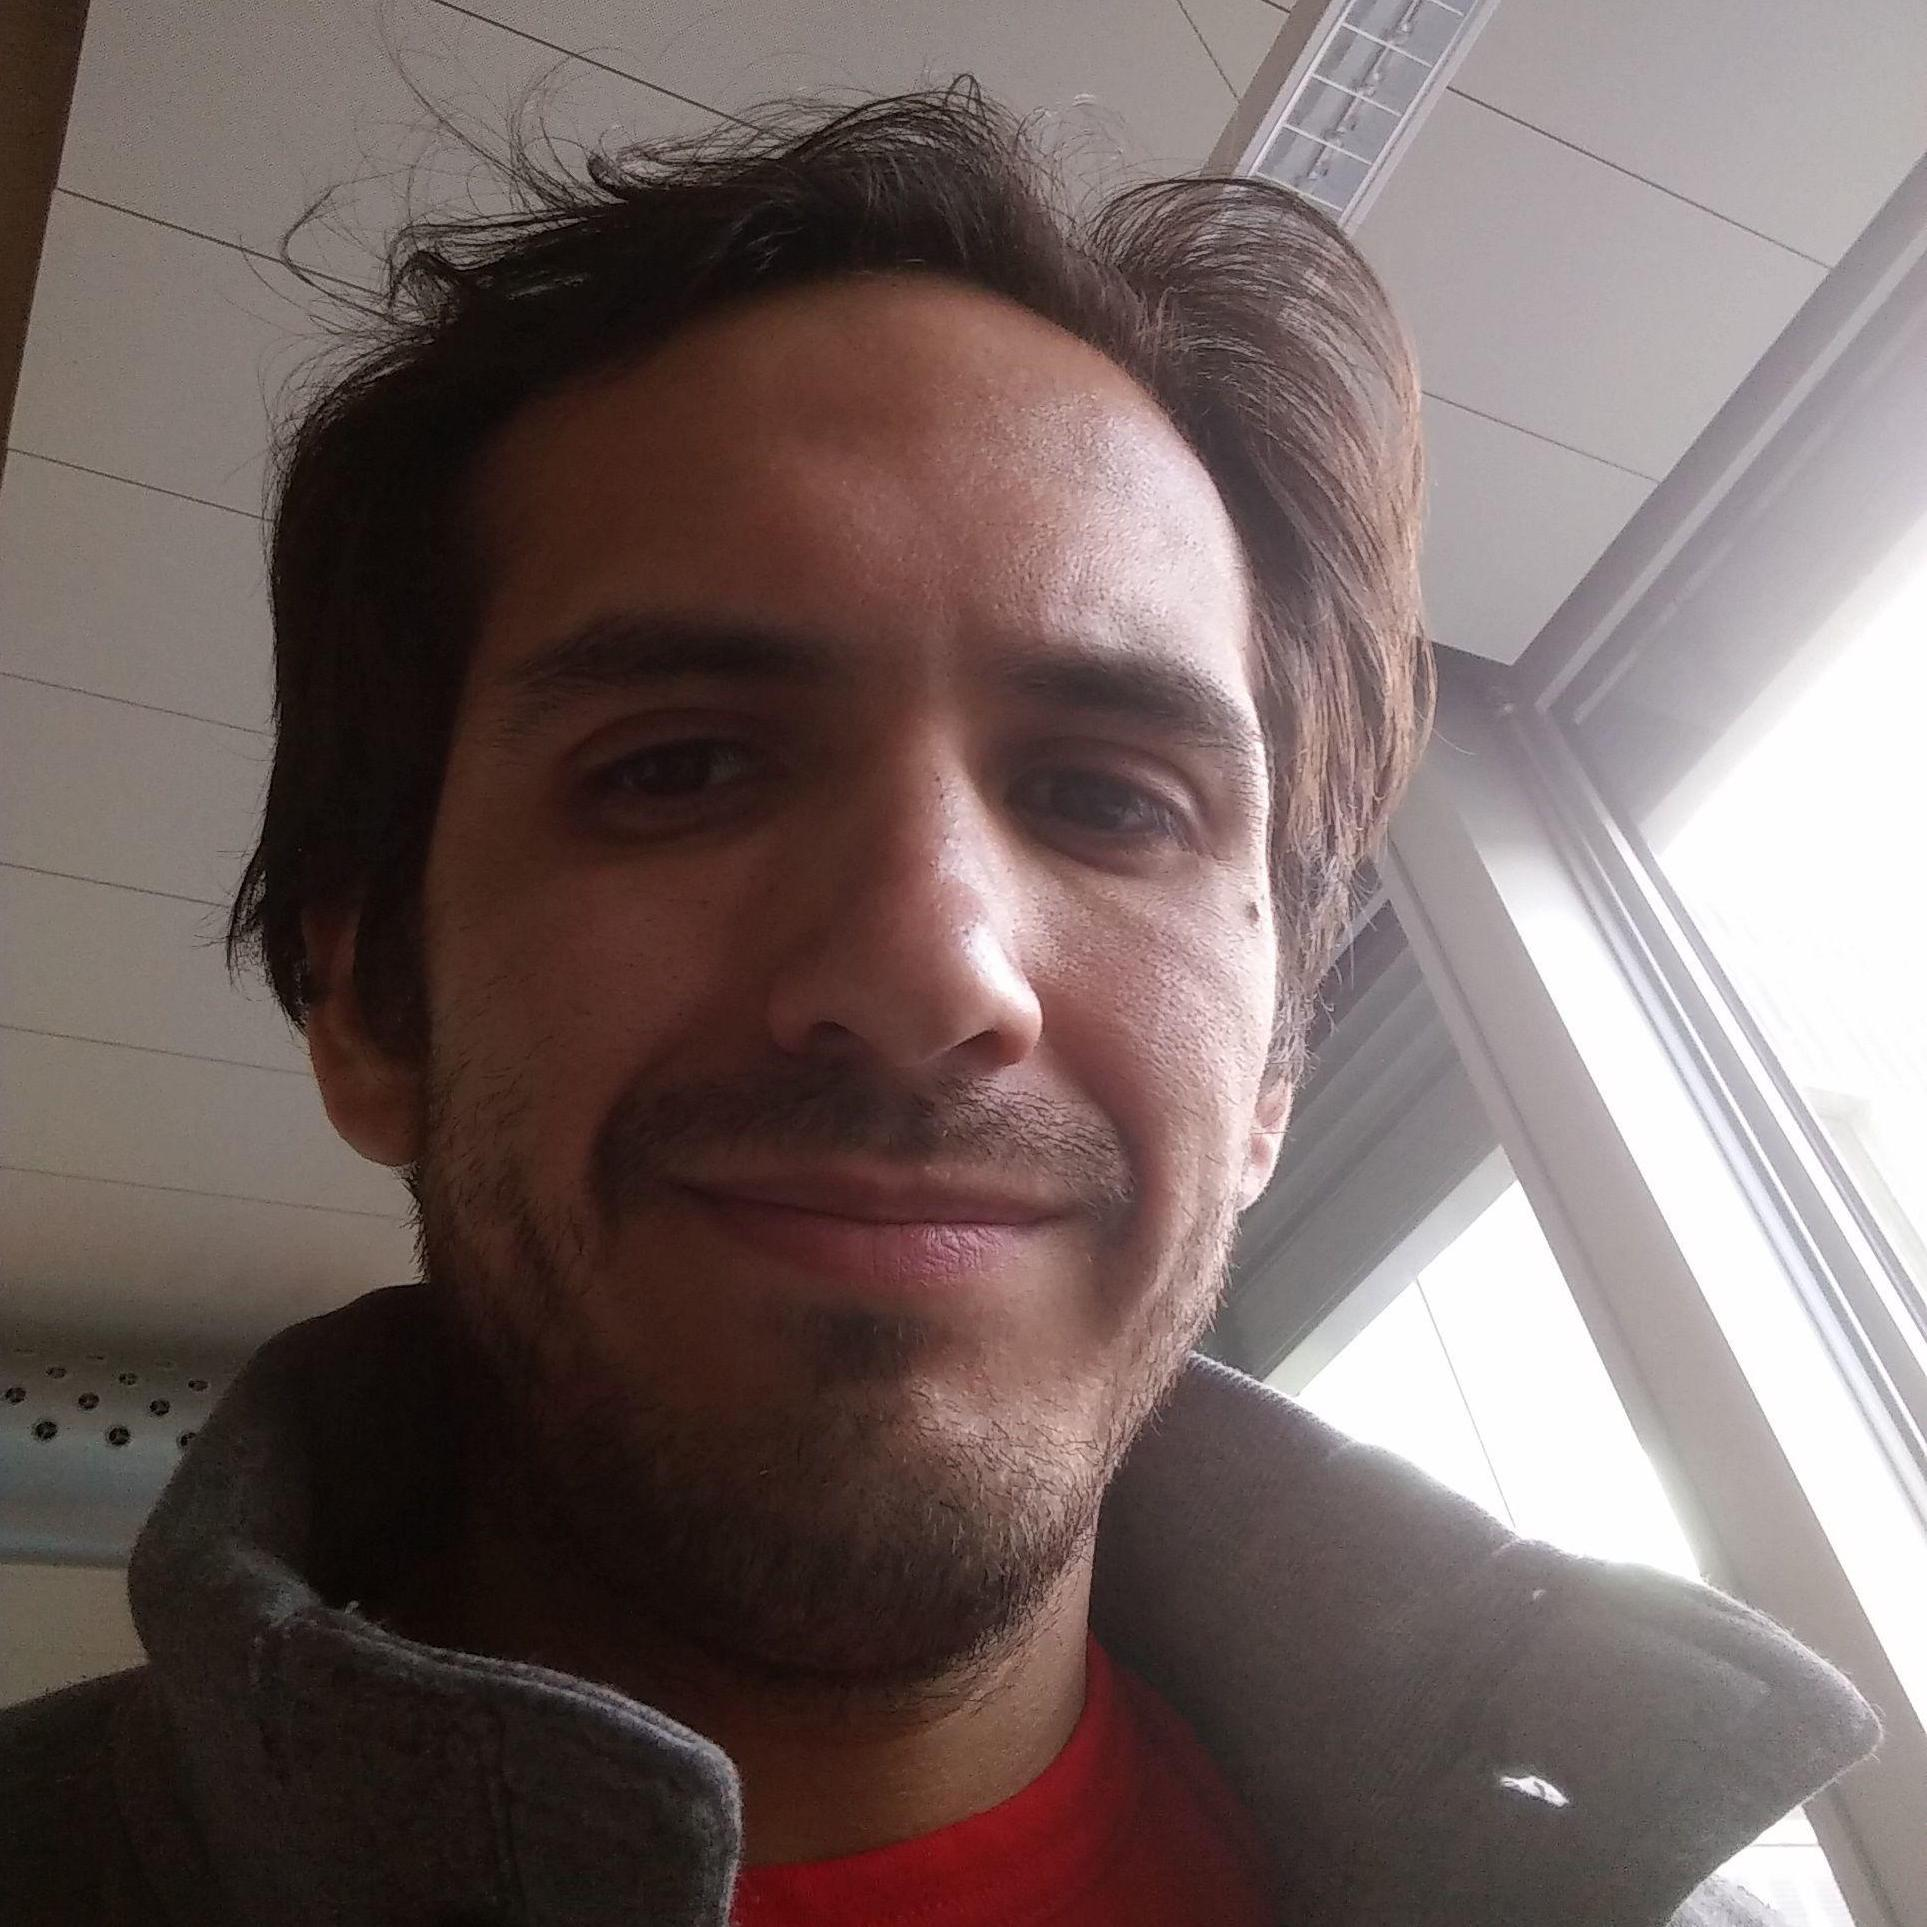 https://secure.meetupstatic.com/photos/member/6/a/0/8/highres_256947144.jpeg